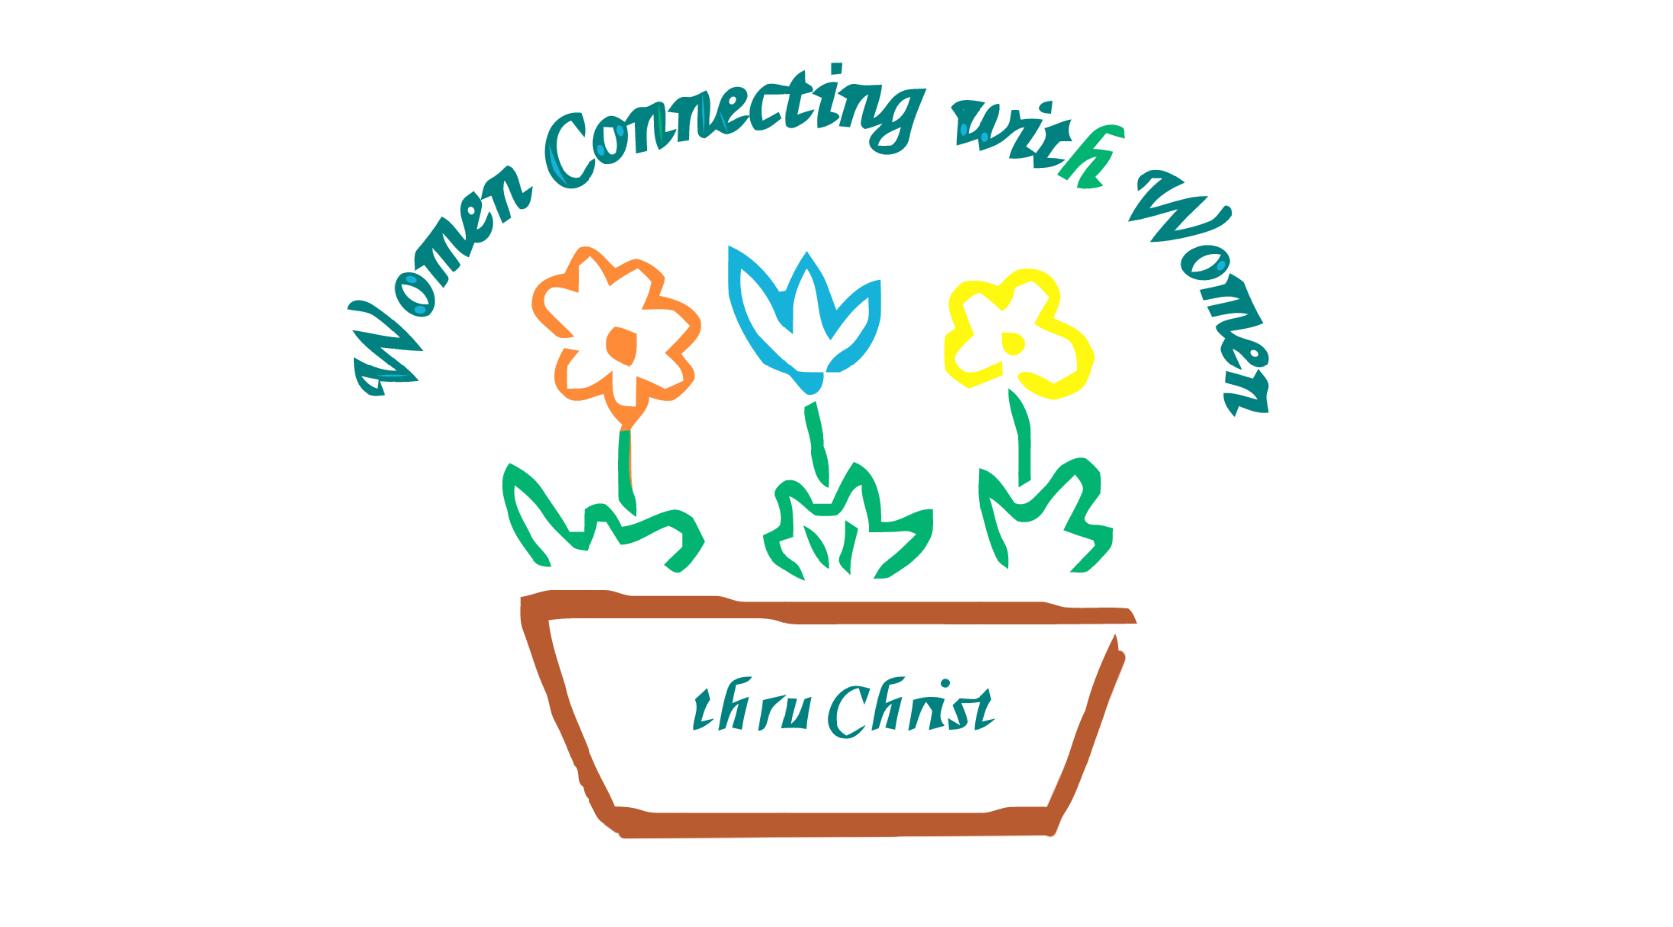 Women connecting w women